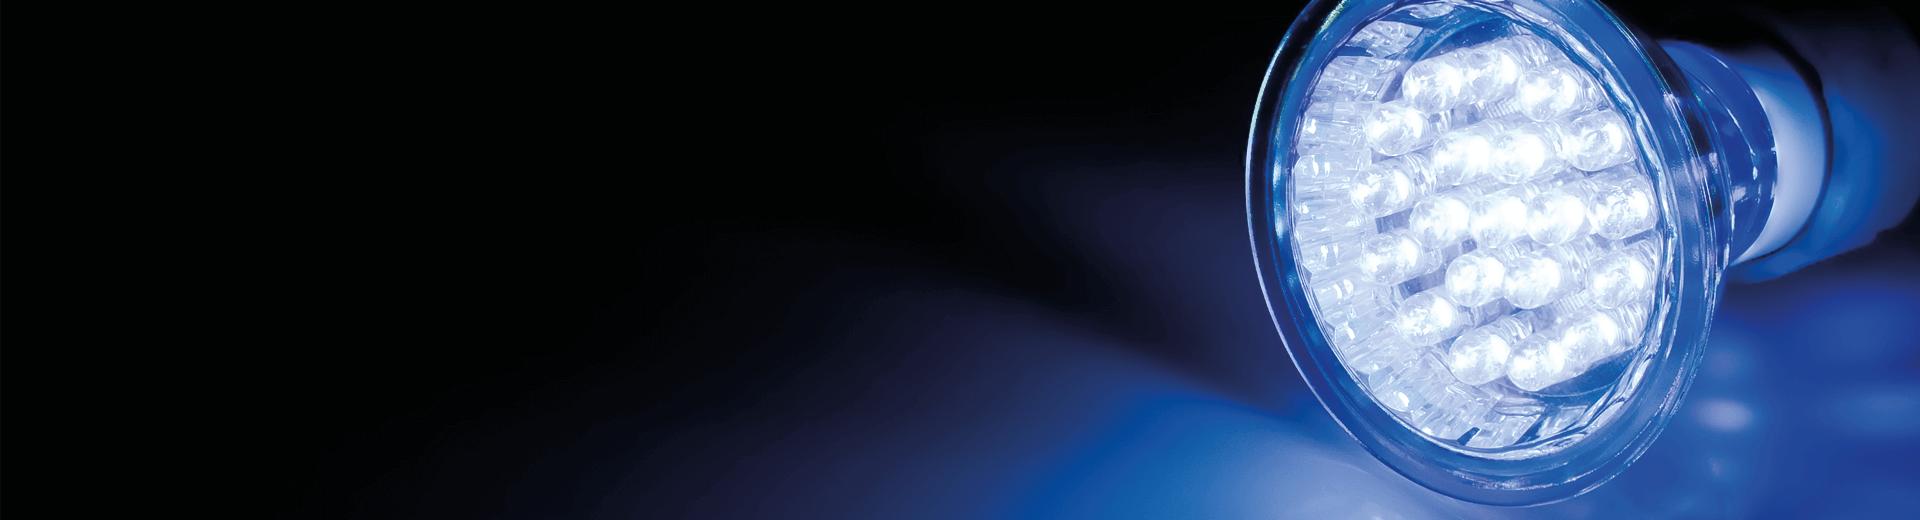 slider-beleuchtung